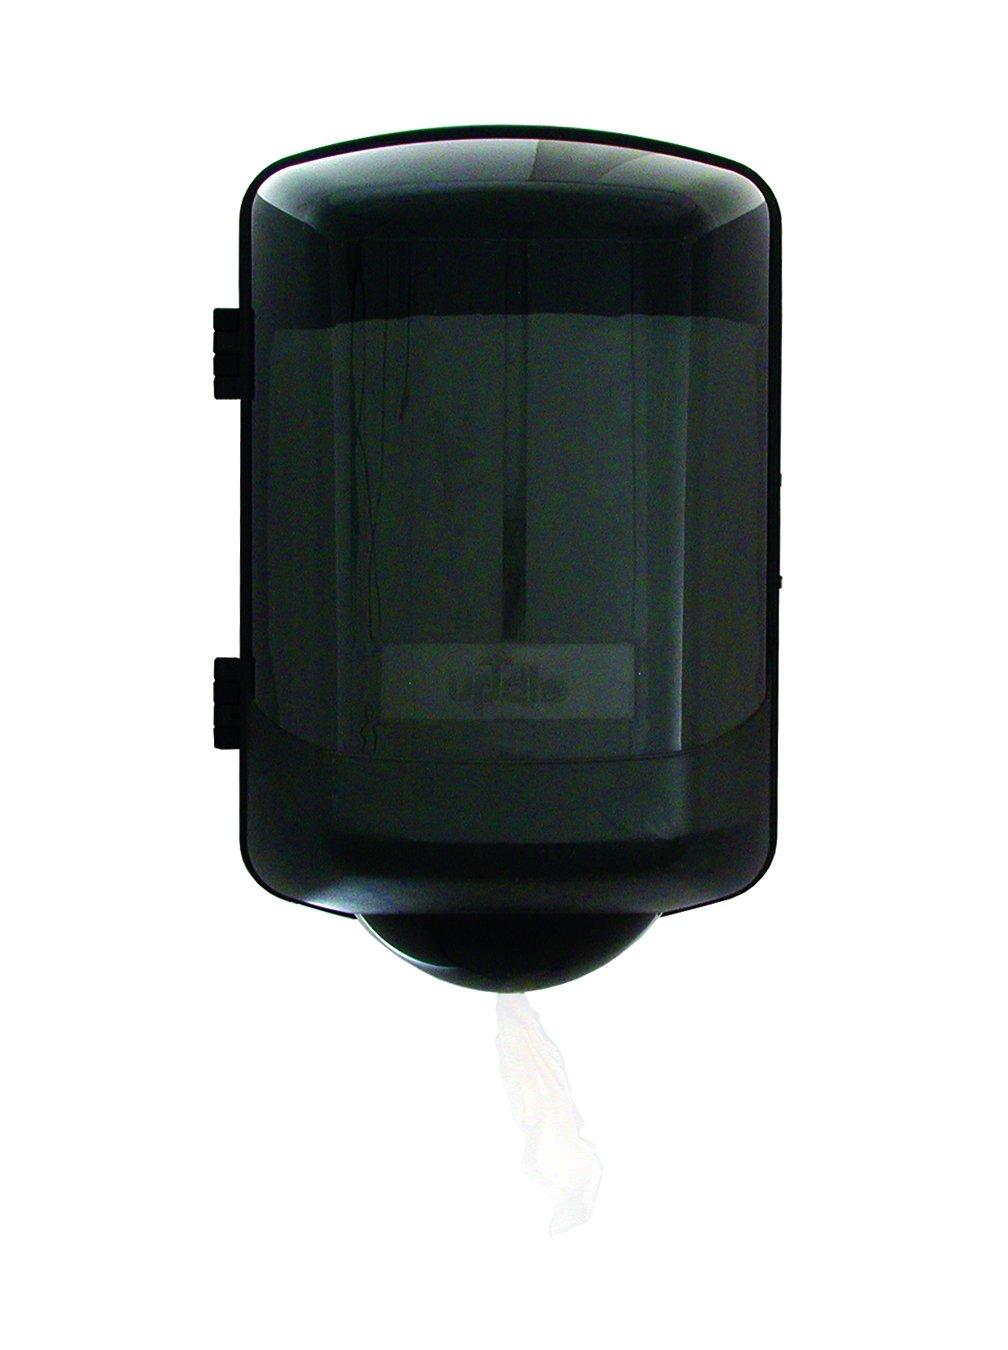 Update International (TD-CP) 9'' x 16'' Plastic Center-Pull Paper Towel Dispenser,Silver